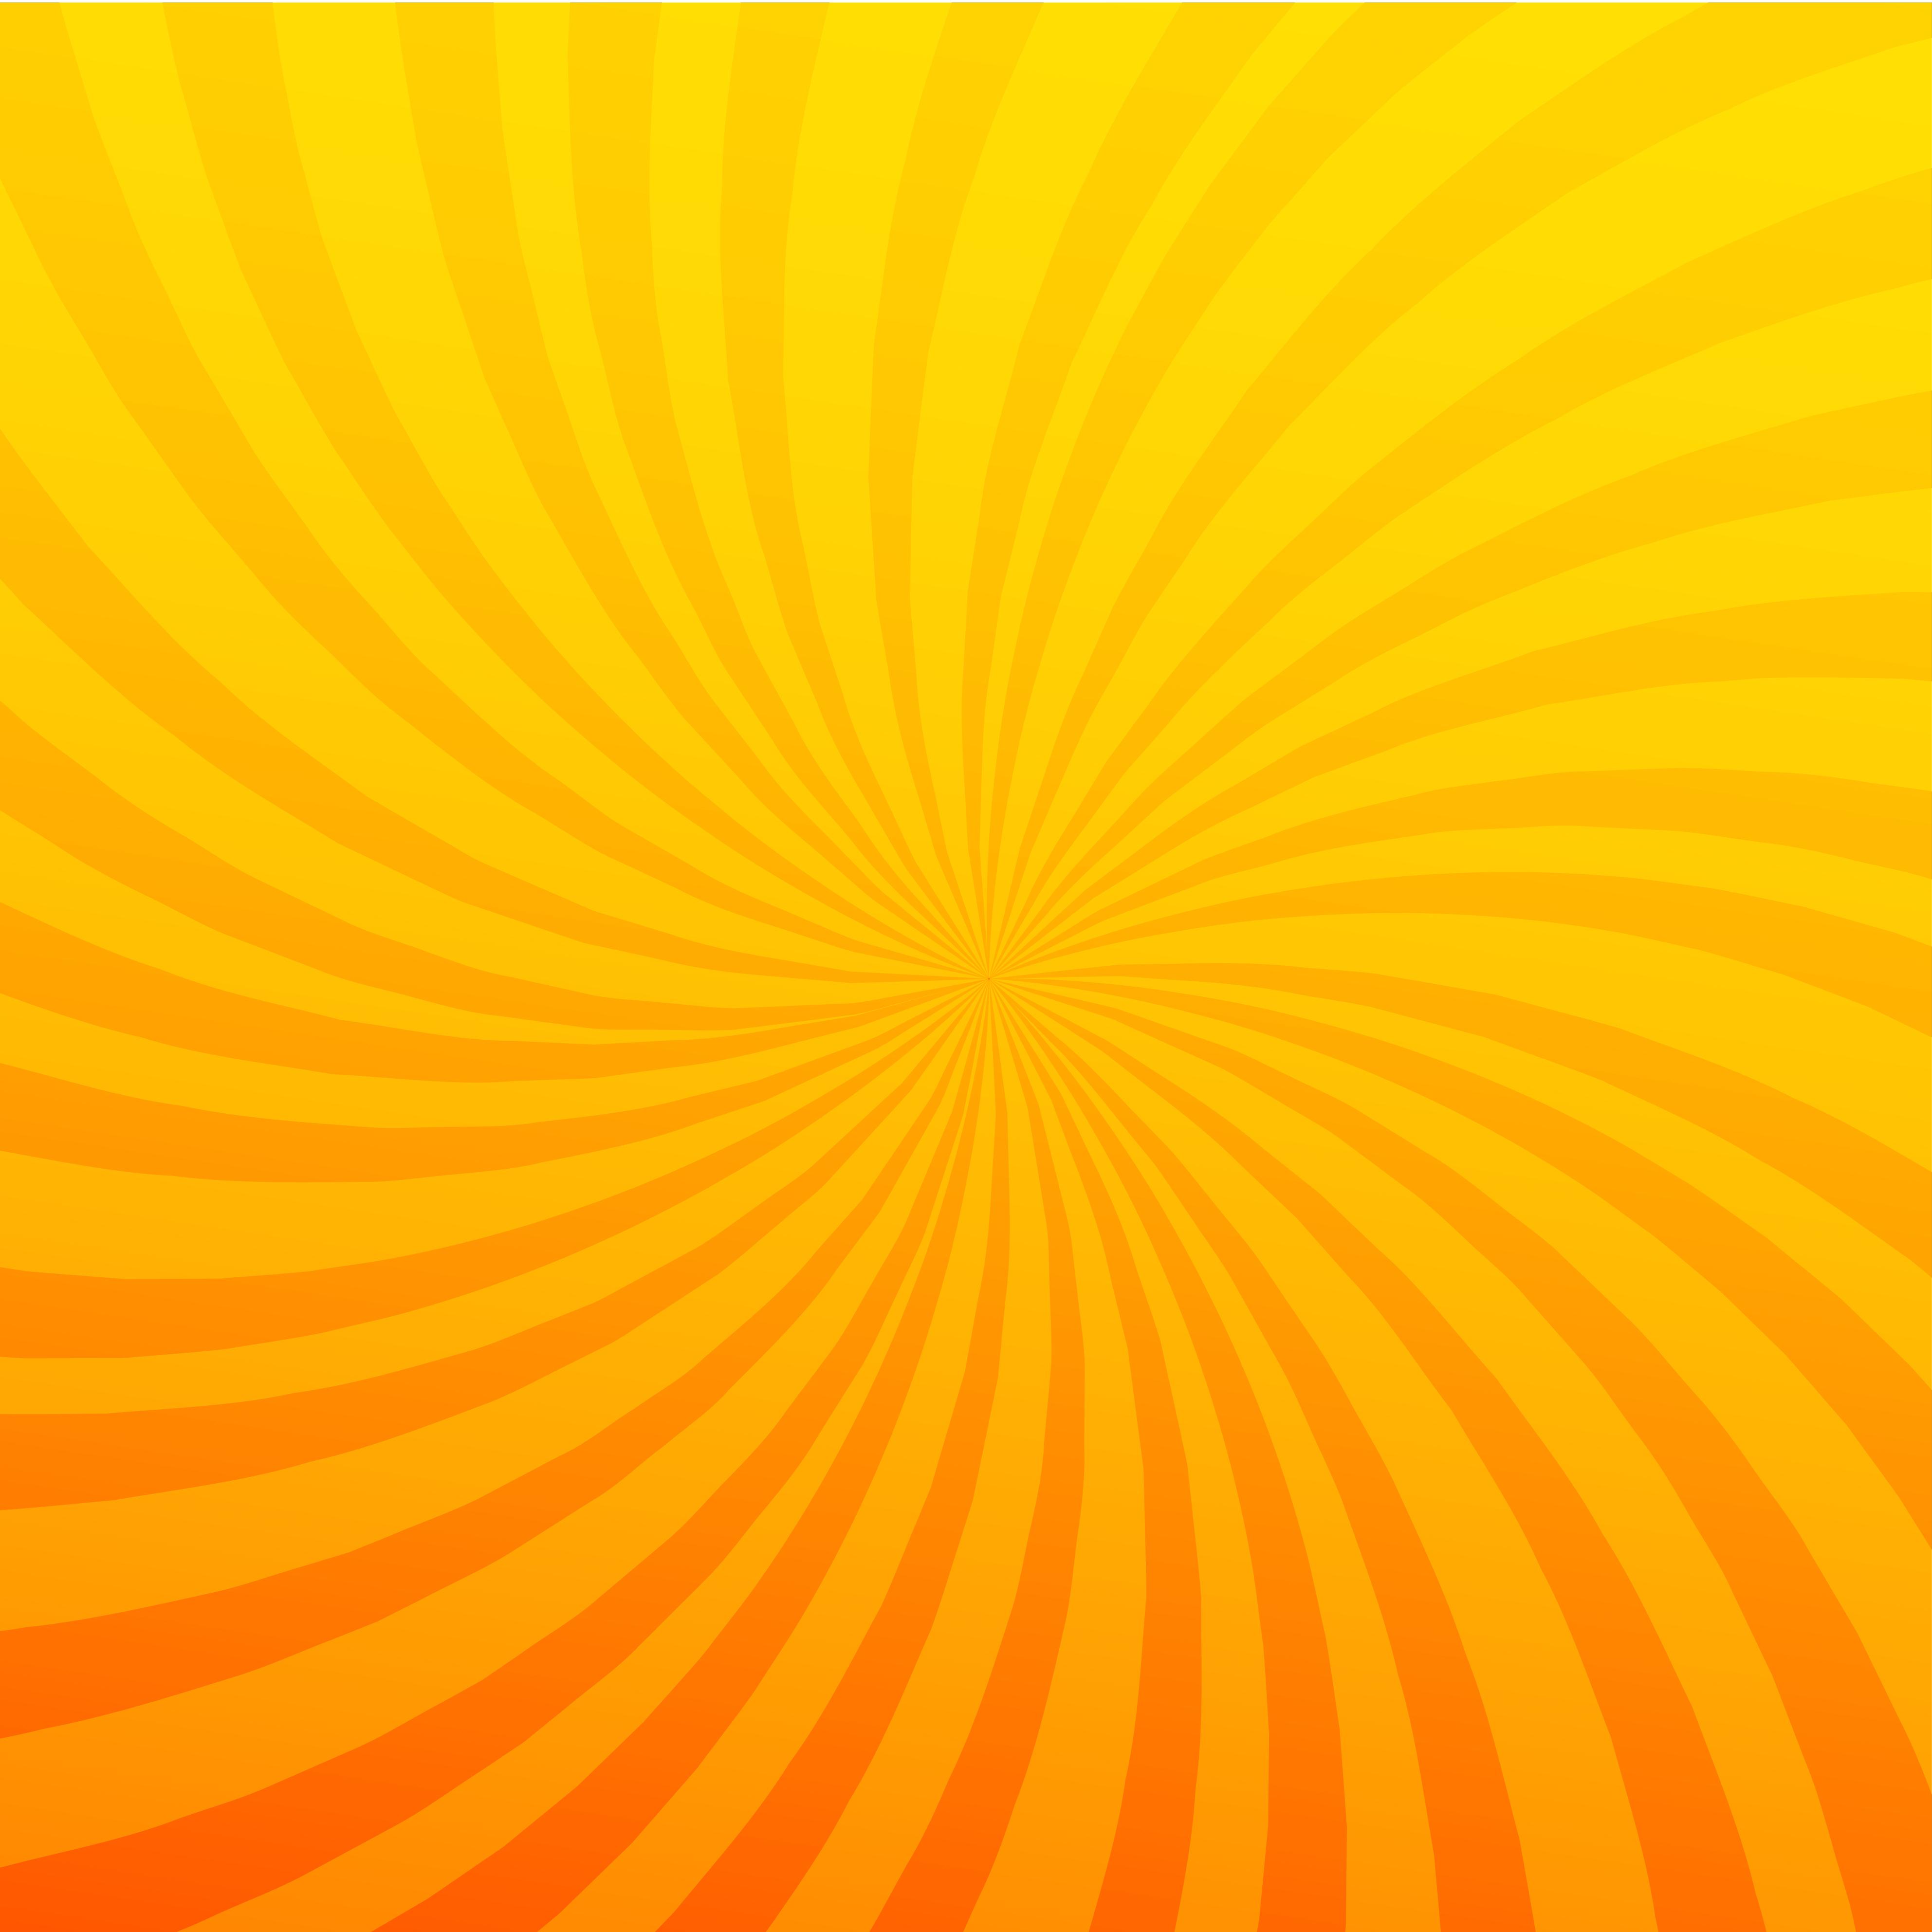 Bright Orange Rays Background Twister Effect Download